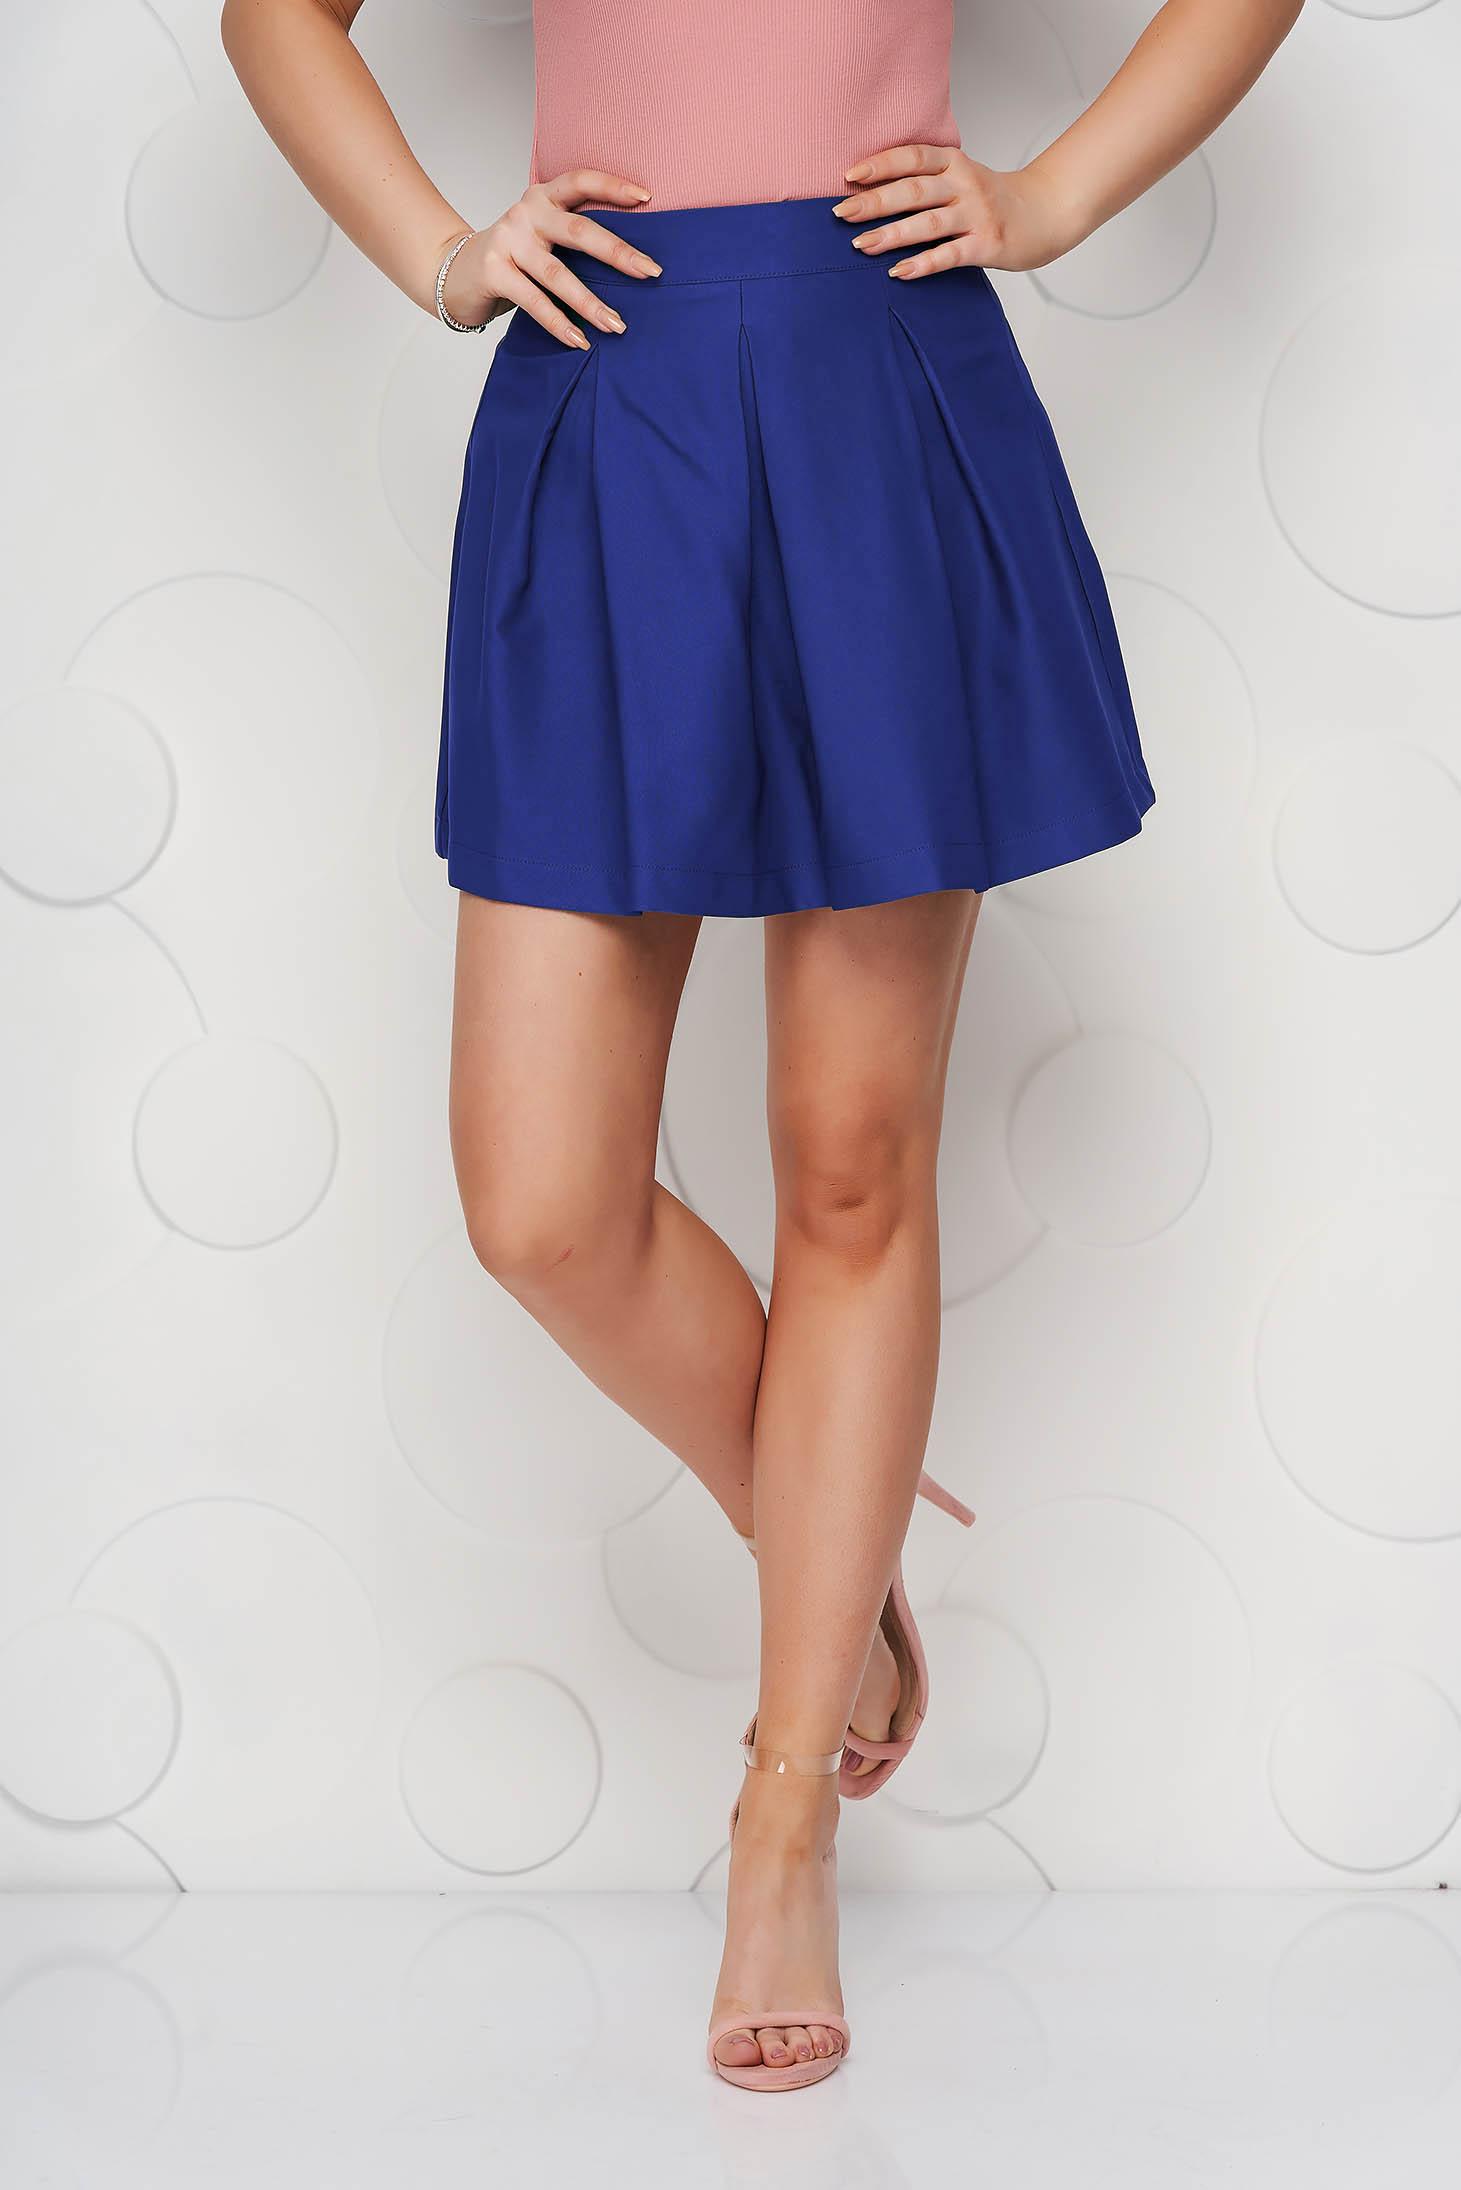 Blue casual cloche skirt slightly elastic fabric medium waist